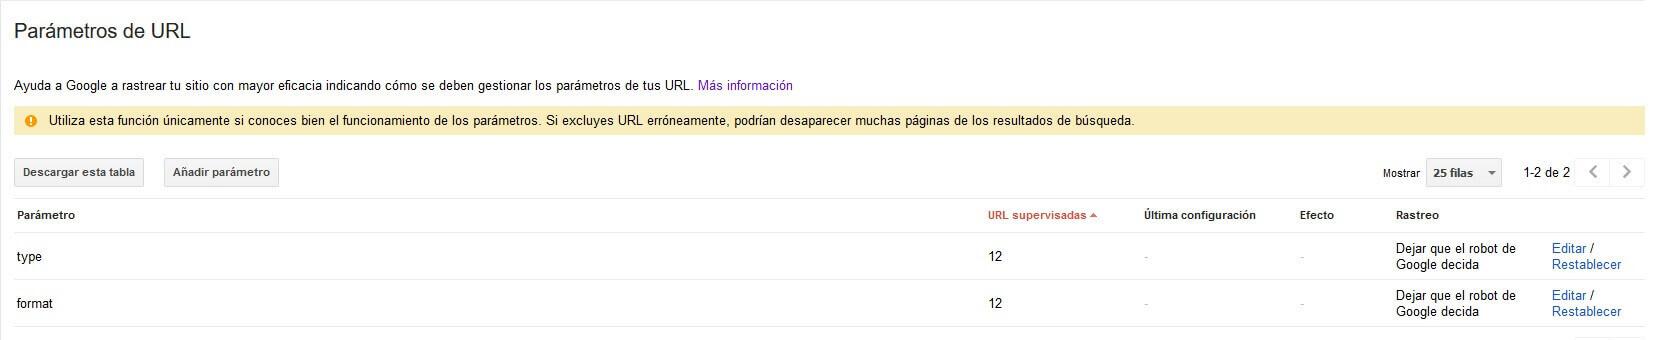 parámetros de url